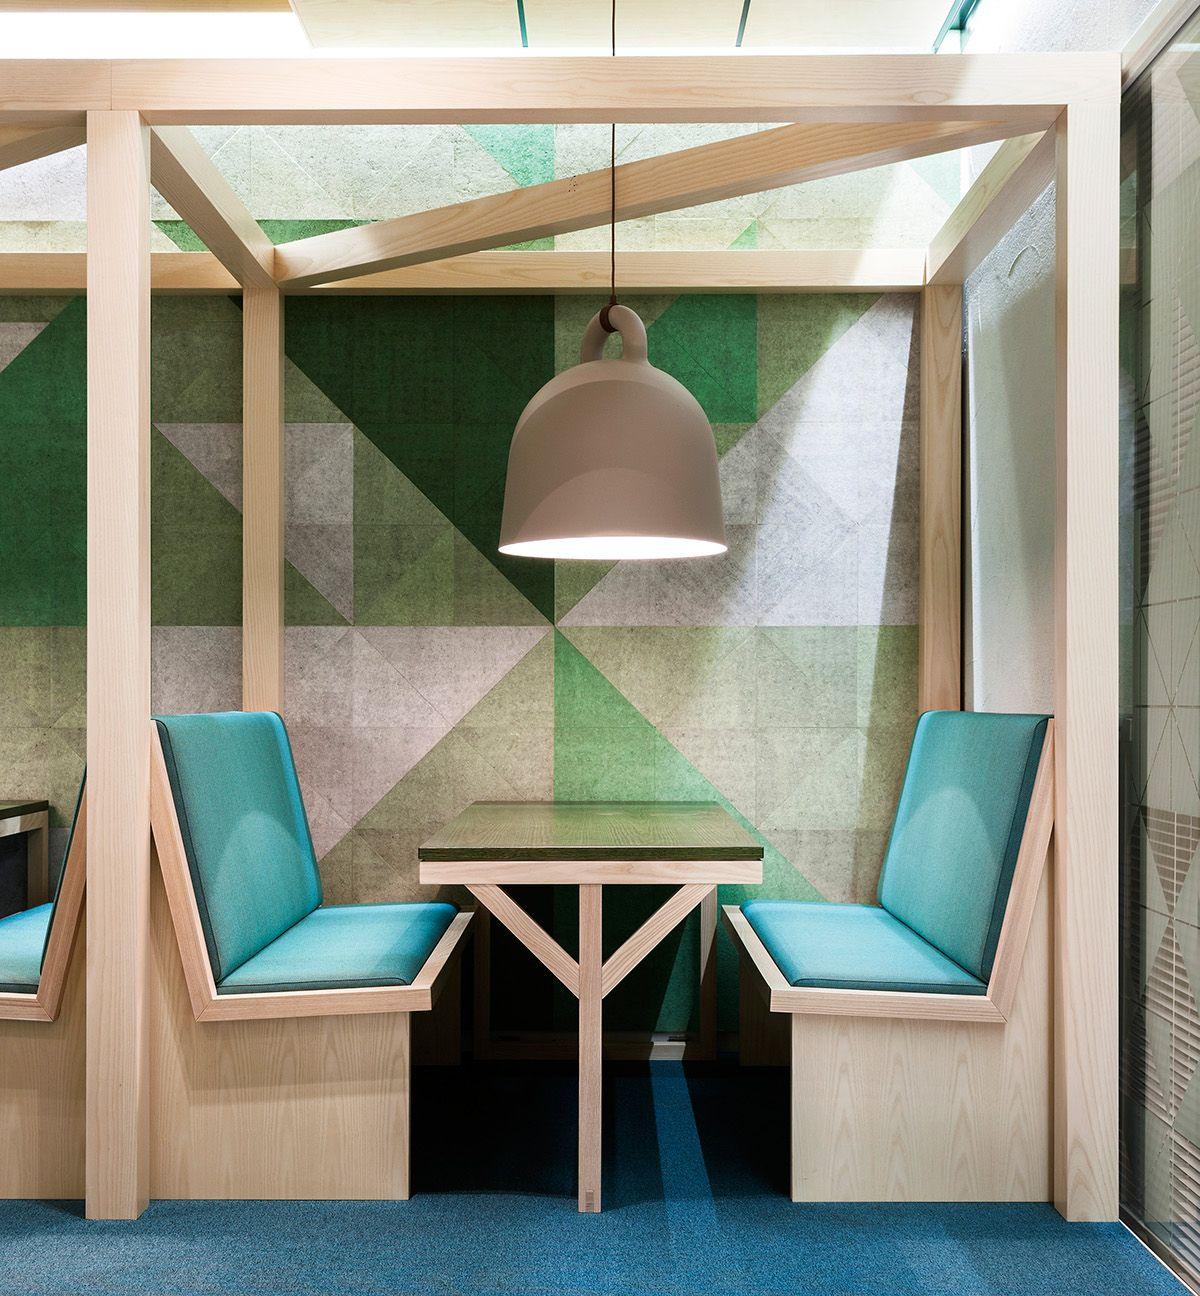 Sponda Canteen By Aleksi Hautam Ki Bond Creative Agency